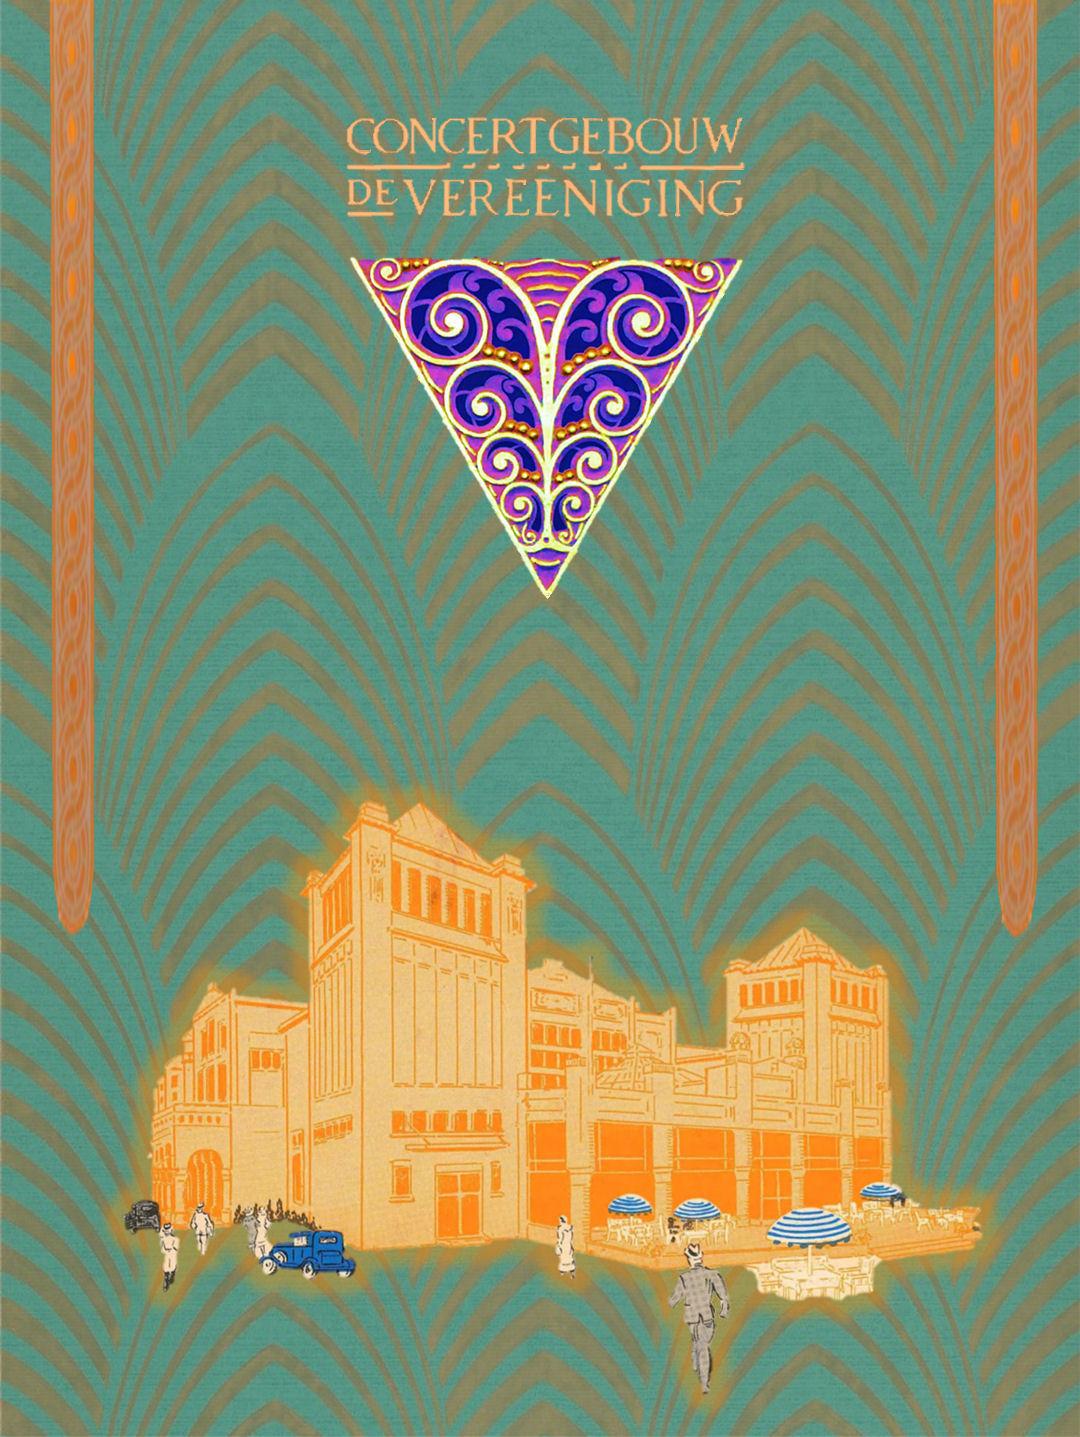 https commons wikimedia org wiki file concertgebouw de vereeniging nijmegen art deco art nouveau 2018 oscar leeuw roger veringmeier jpg